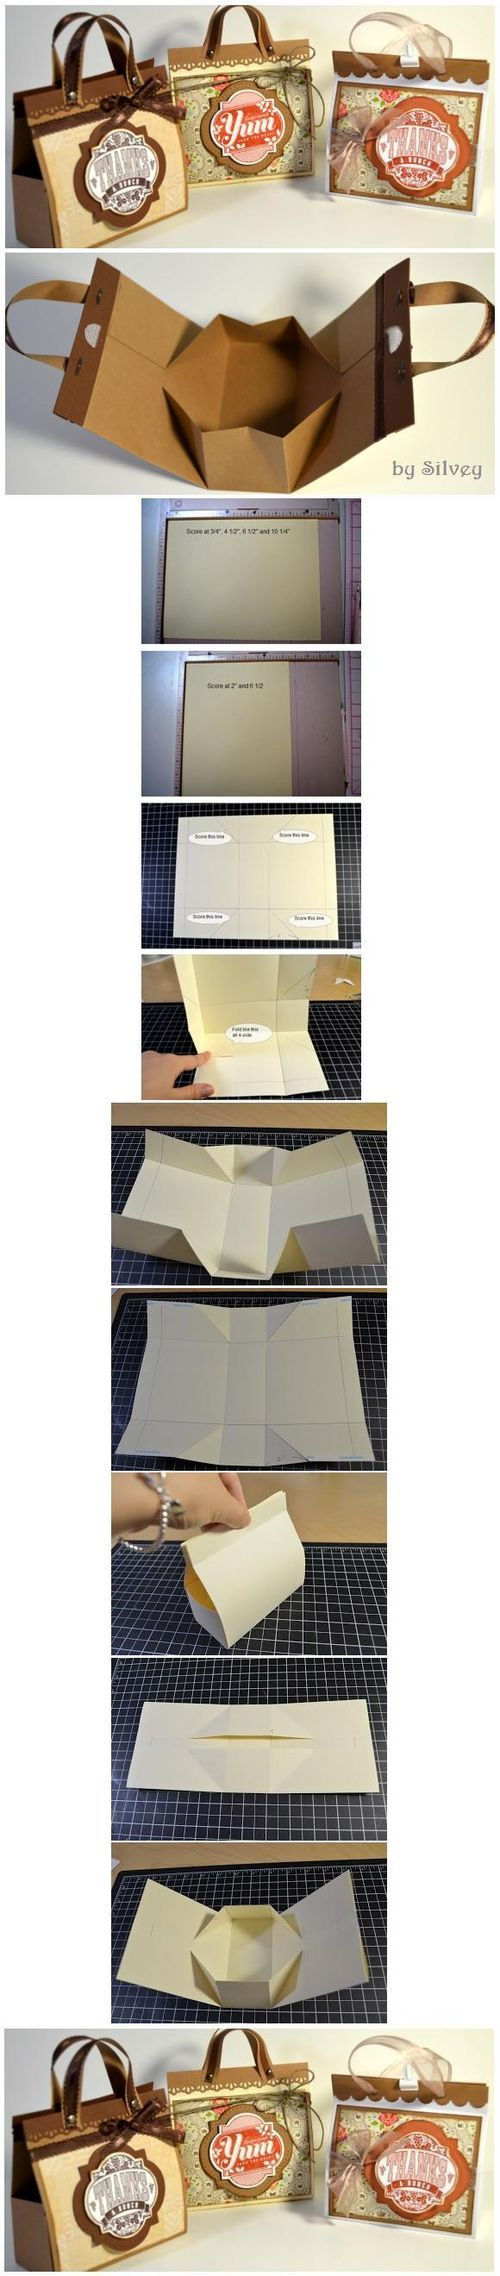 DIY Mini Paper Handbag DIY Projects / UsefulDIY.com